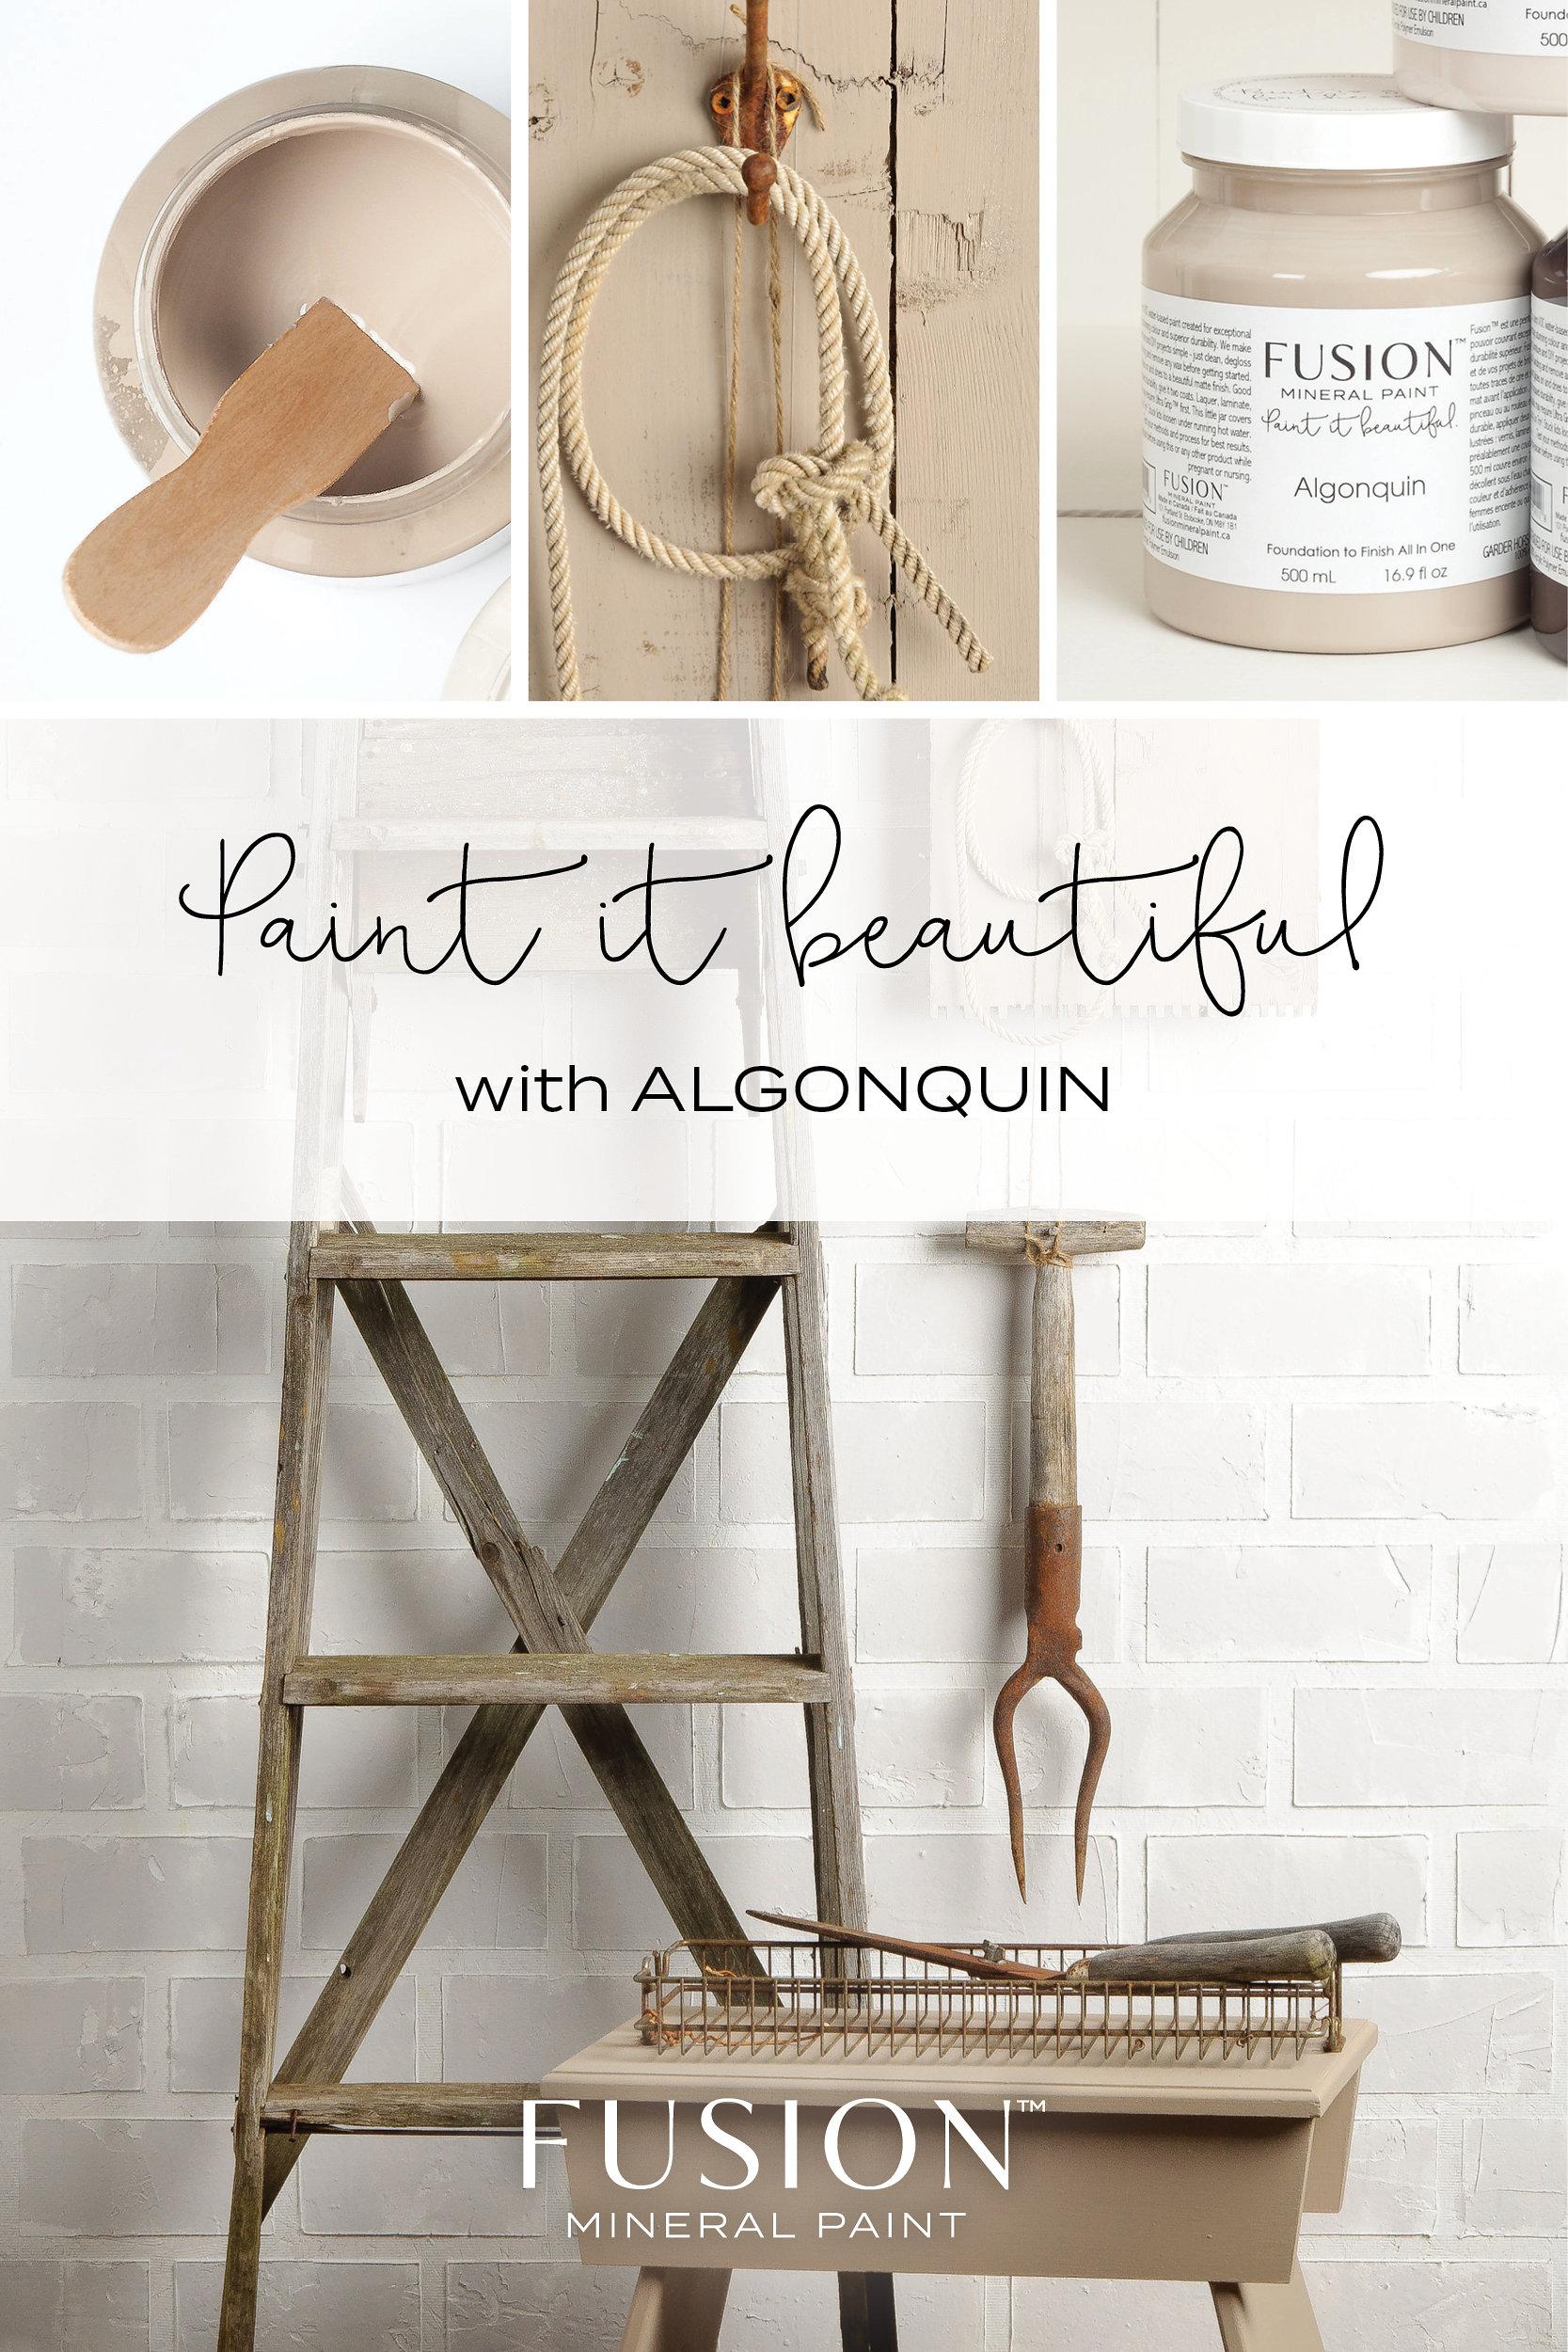 Algonquin geschilderde items